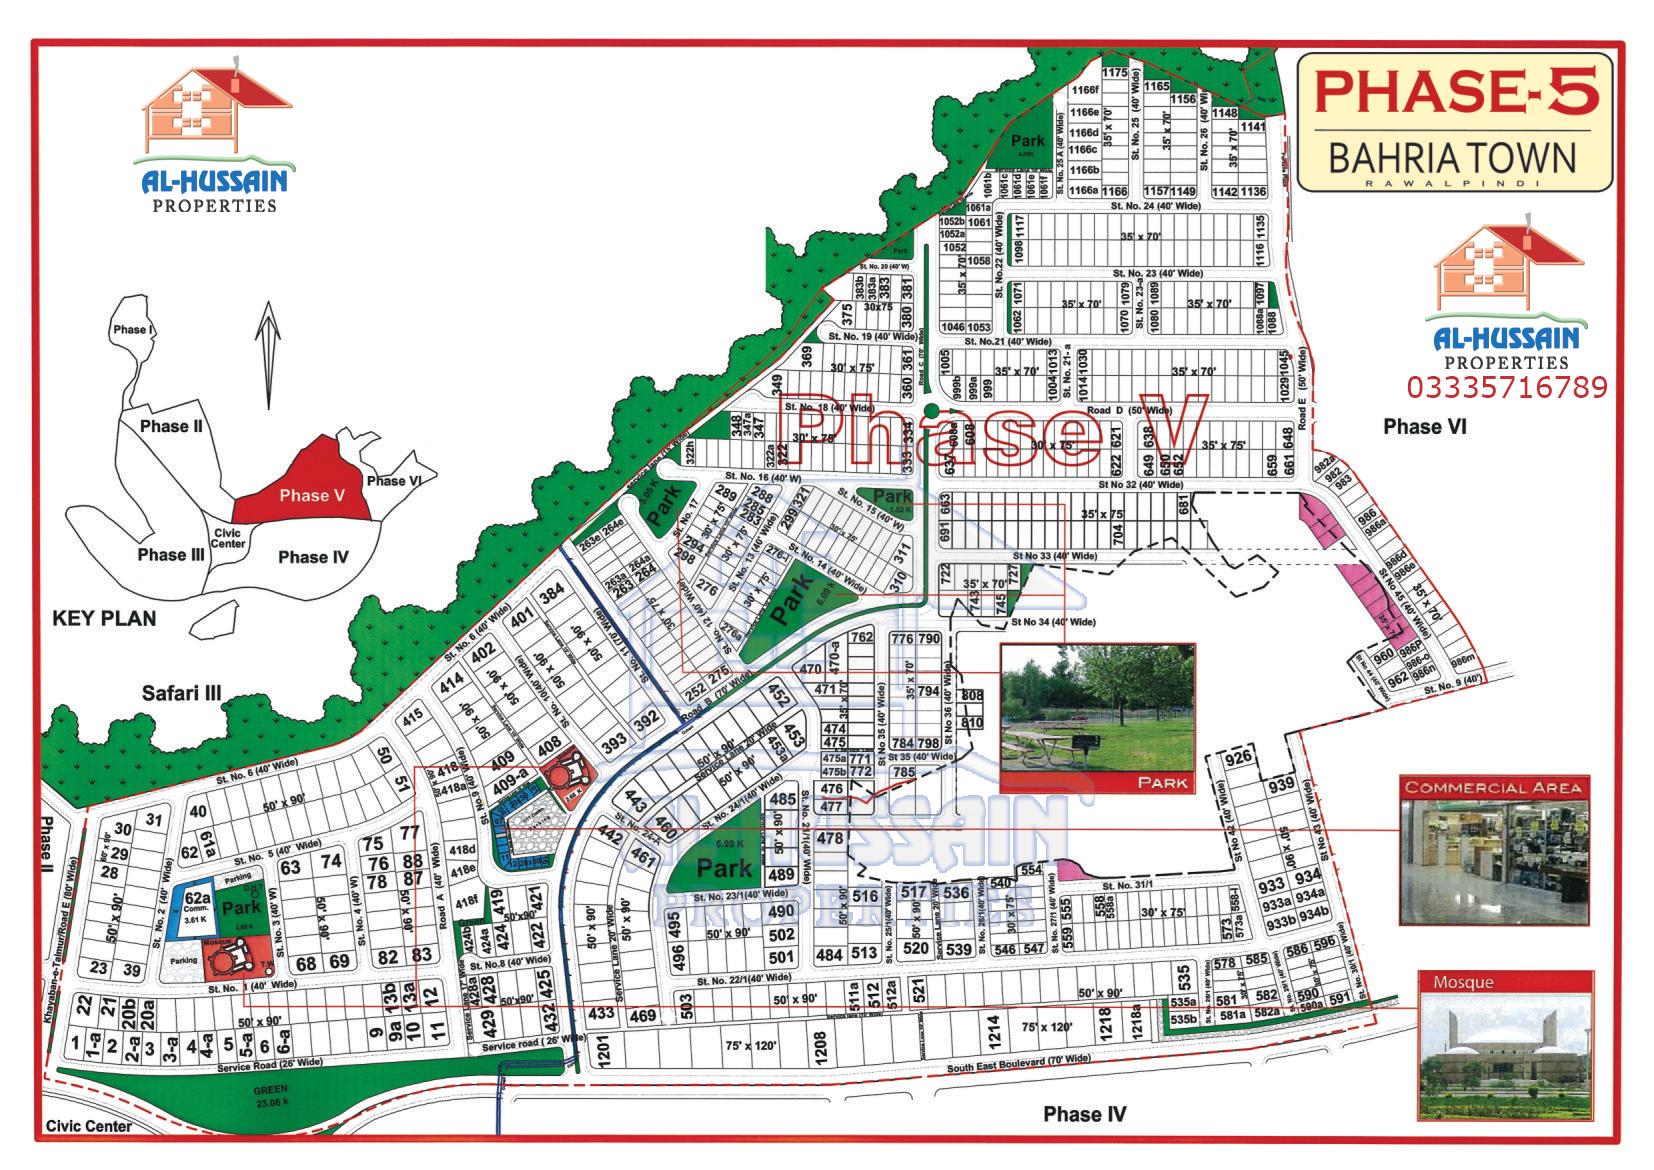 Phase 5 Bahria Town Rawalpindi Islamabad